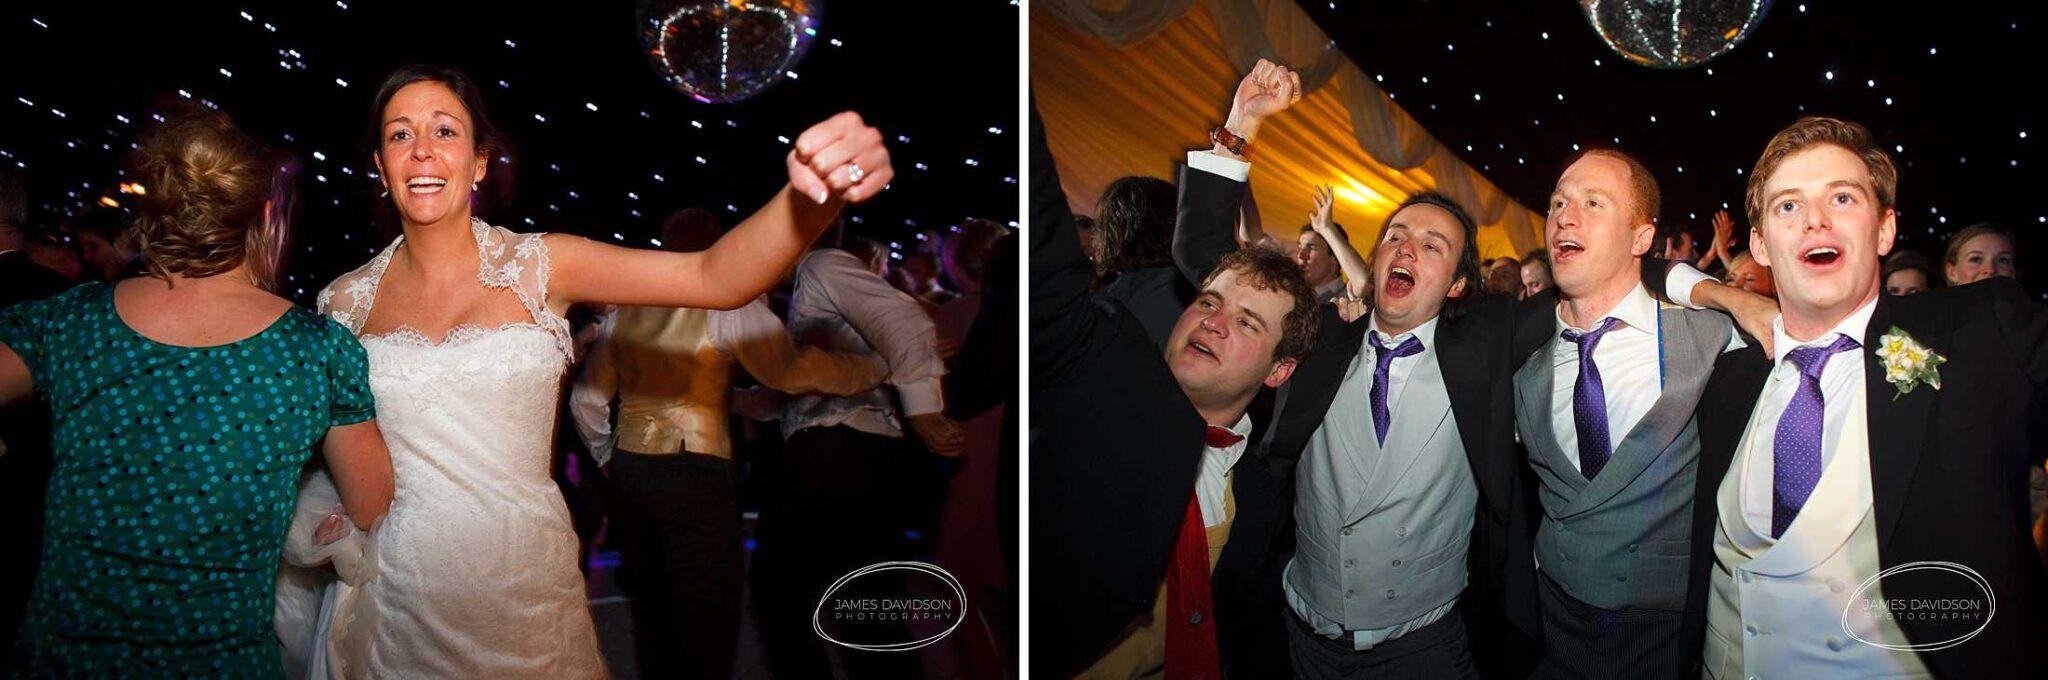 huddersfield-wedding-photography-071